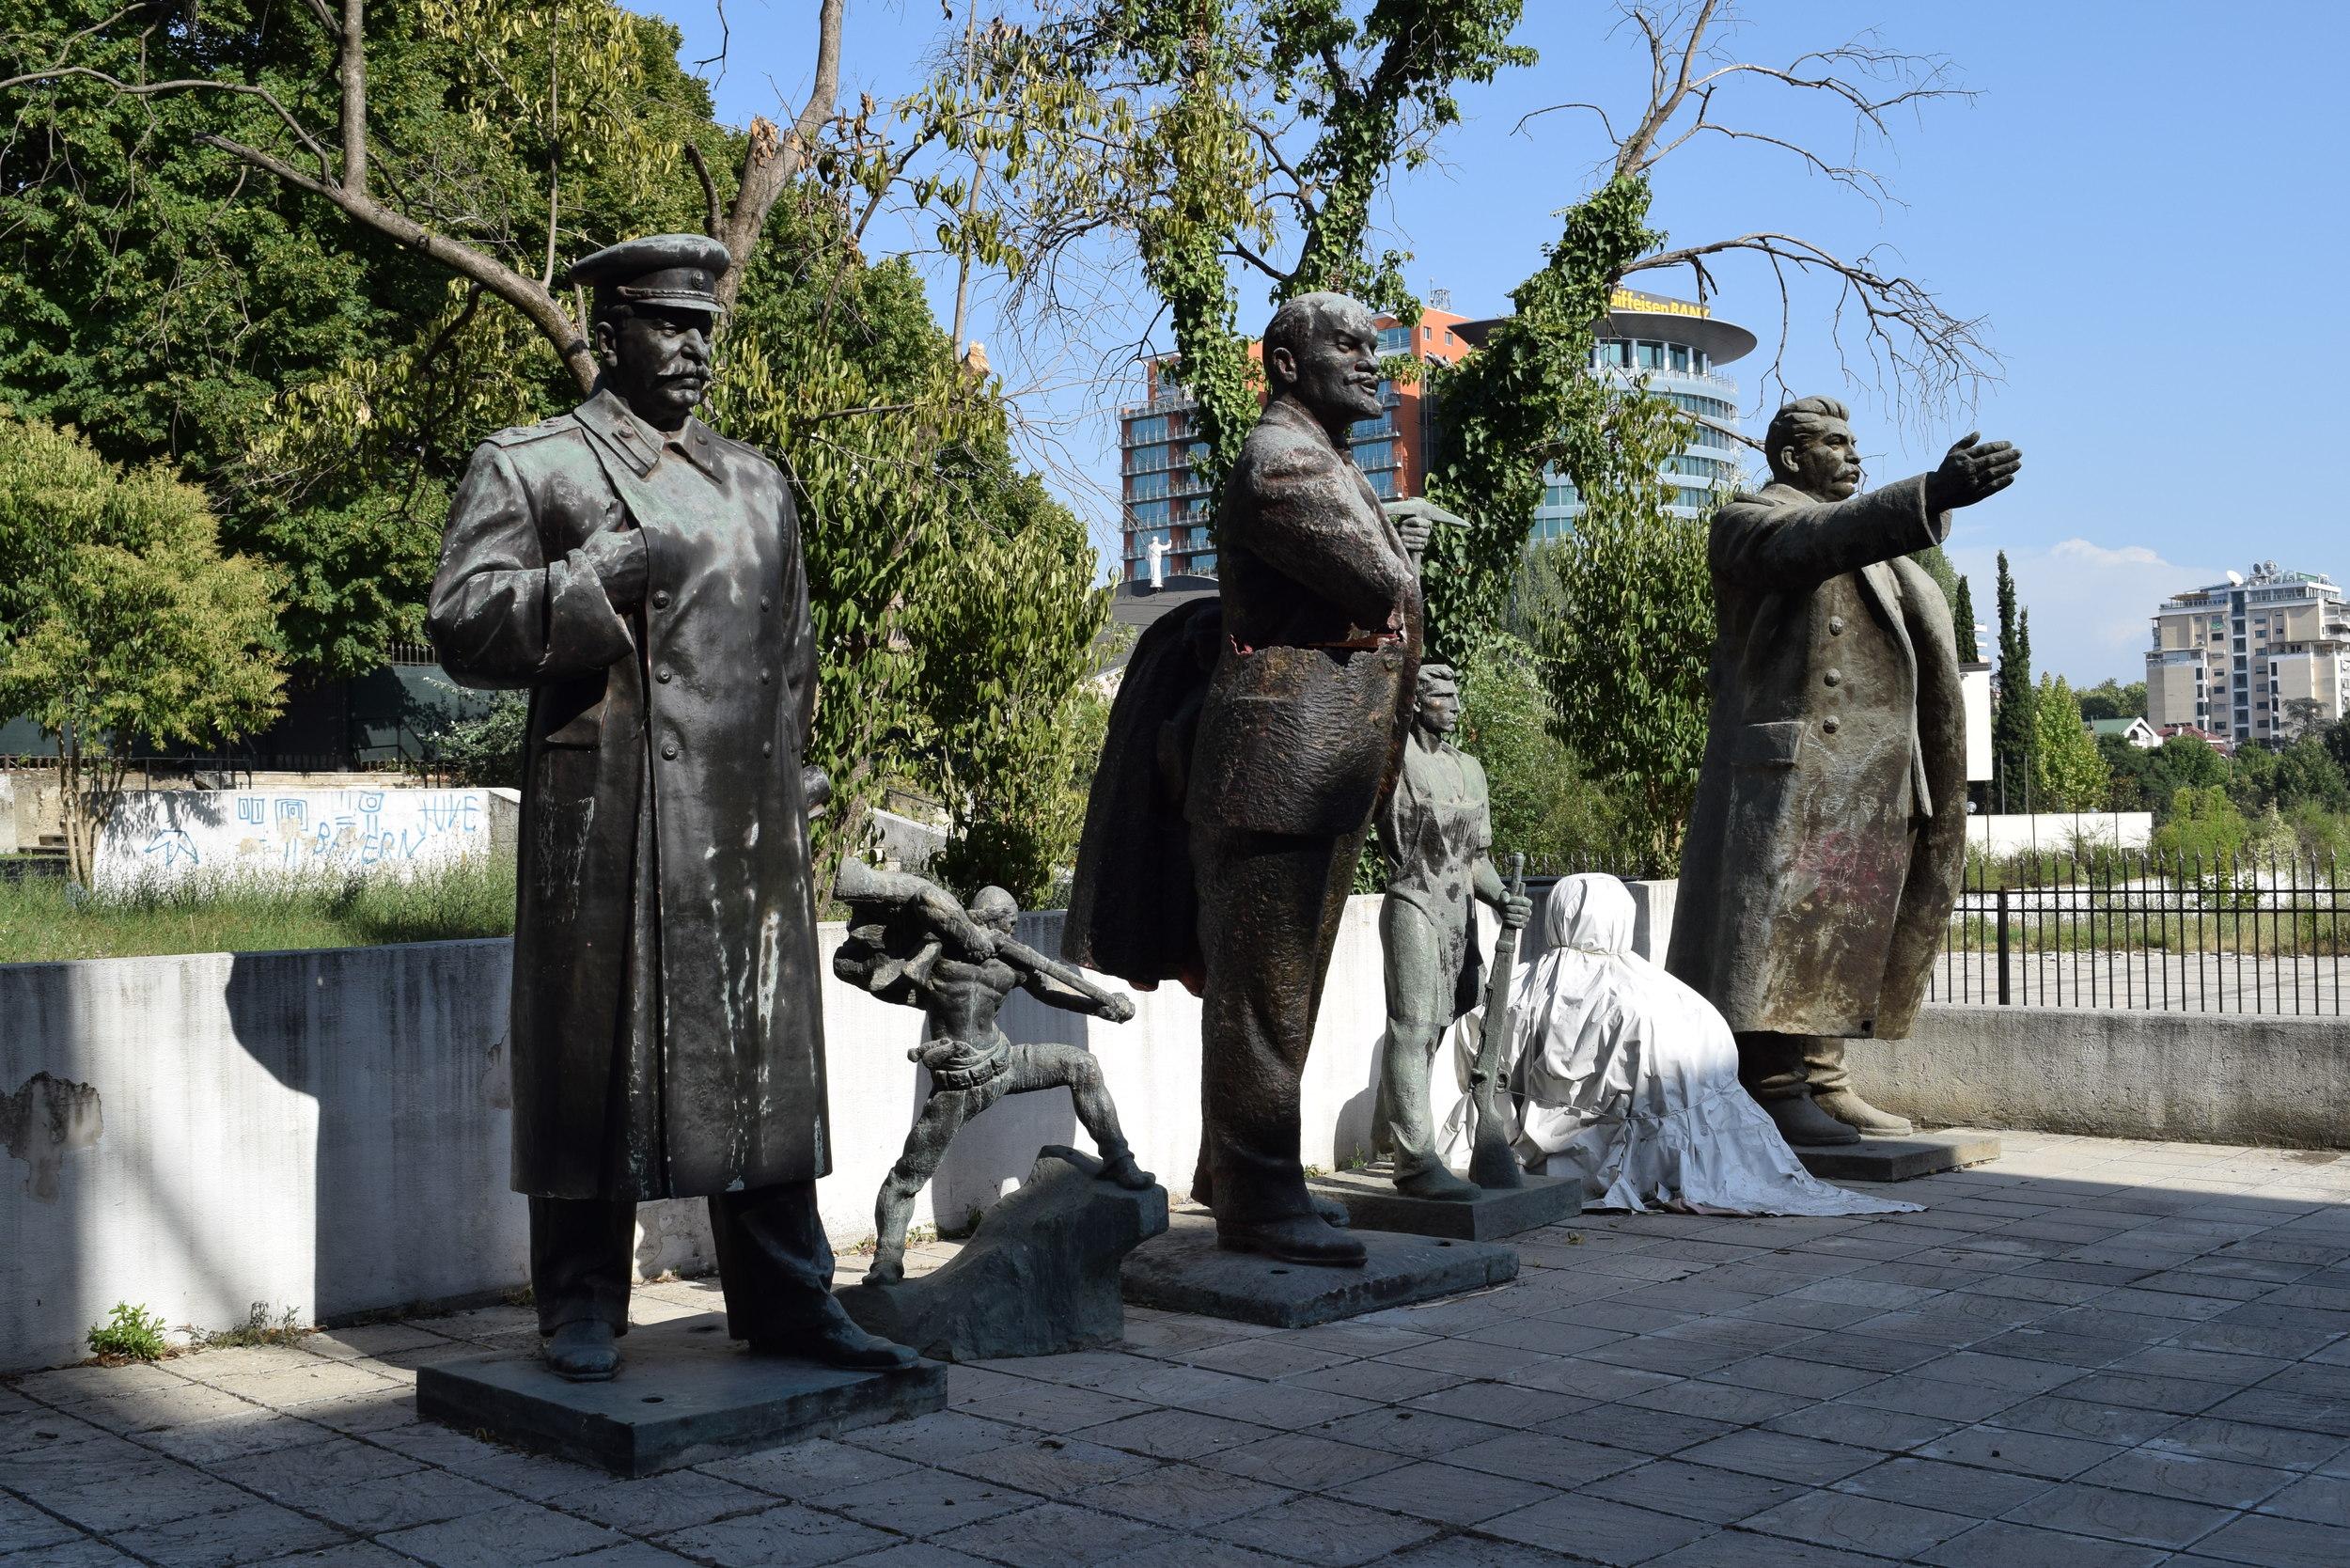 Communist statues in Tirana